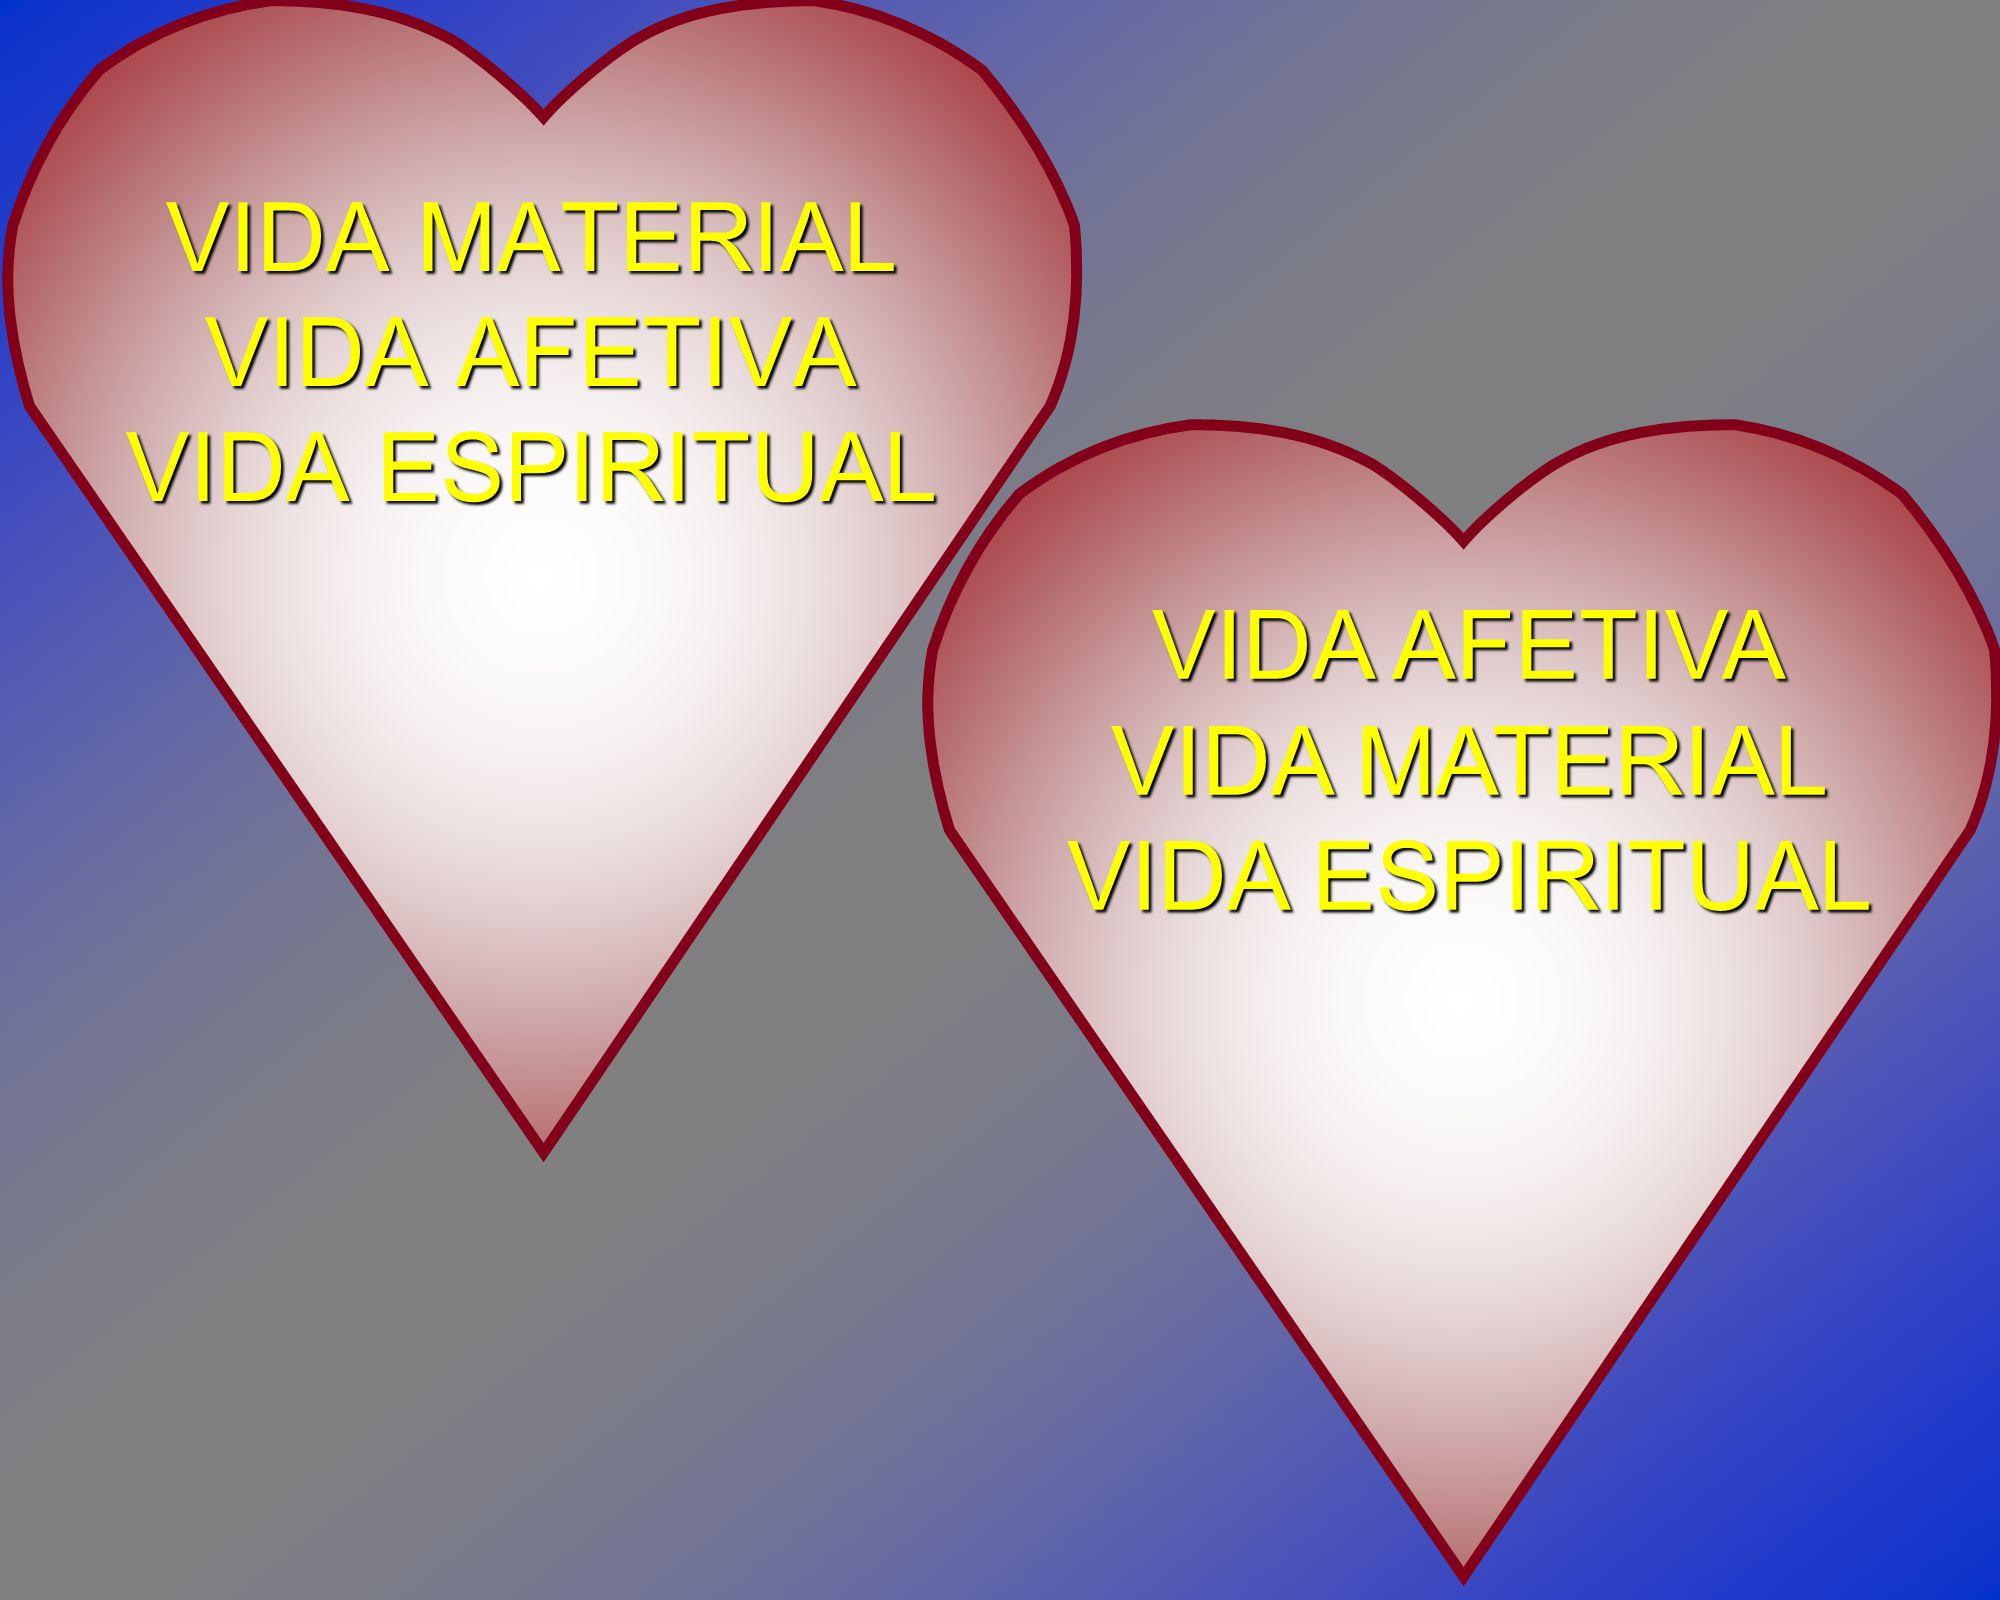 VIDA MATERIAL VIDA AFETIVA VIDA ESPIRITUAL VIDA AFETIVA VIDA MATERIAL VIDA ESPIRITUAL